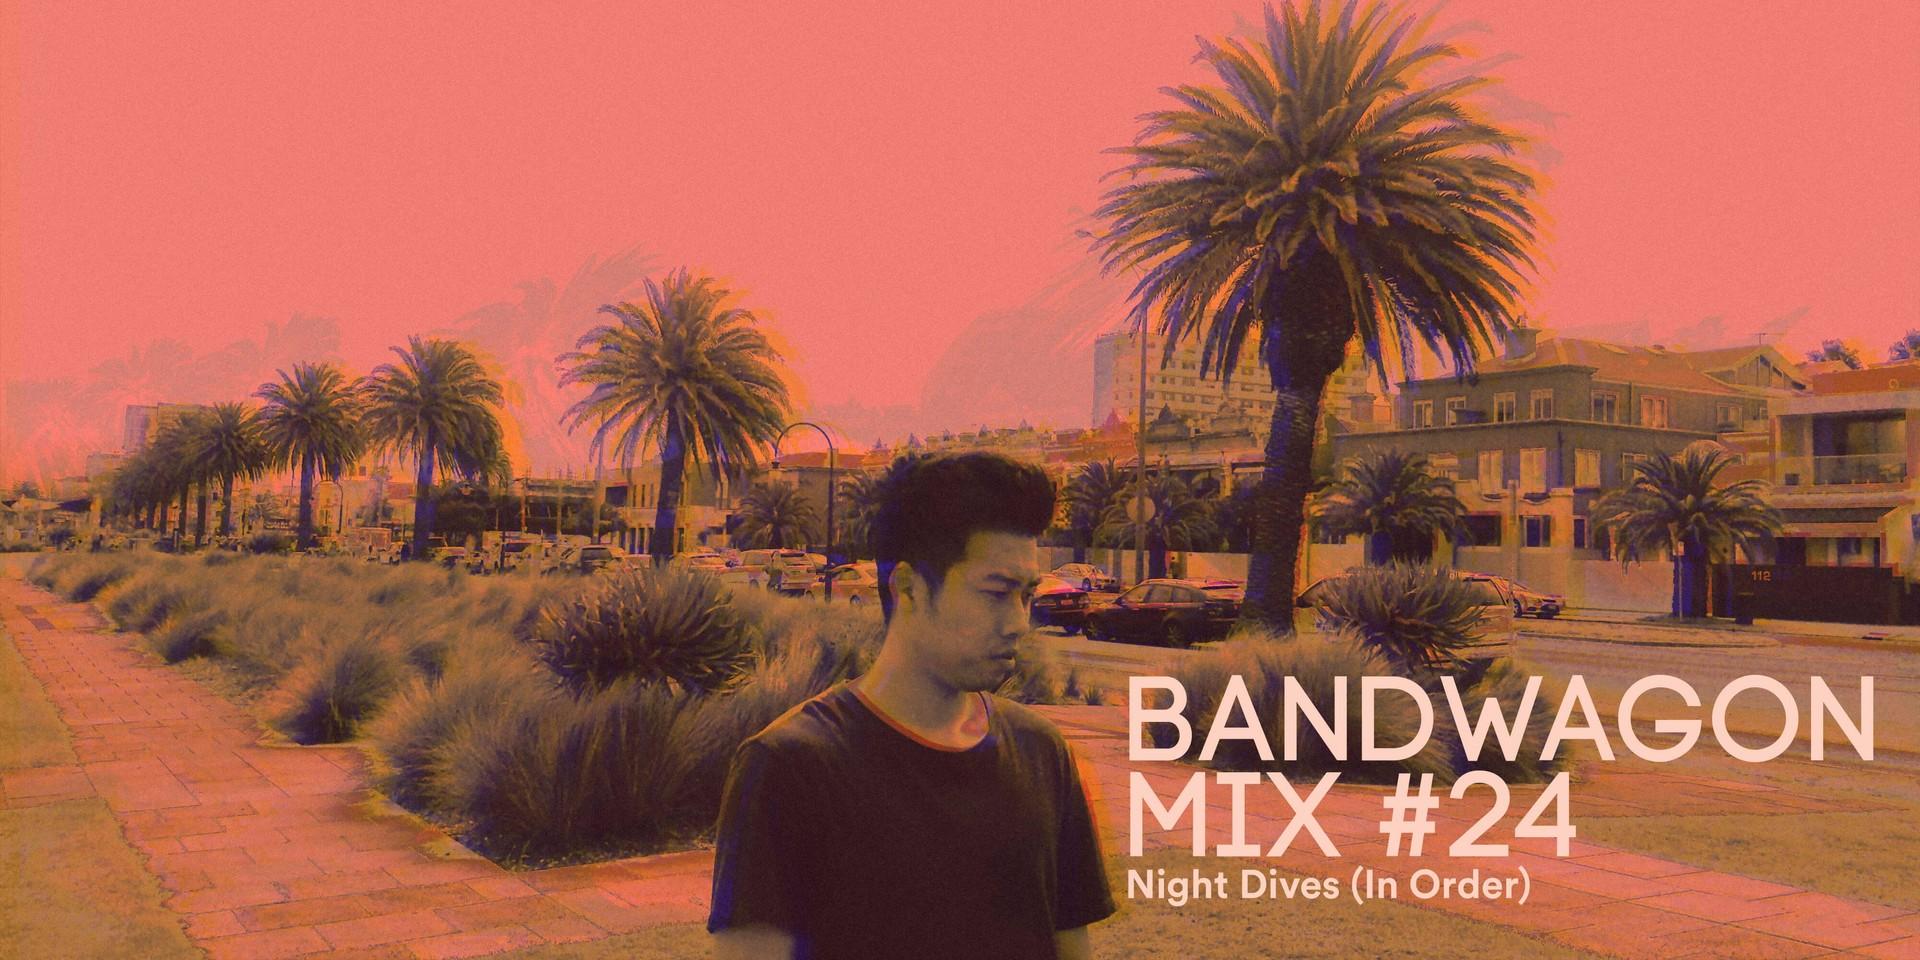 Bandwagon Mix #24: Night Dives (In Order)